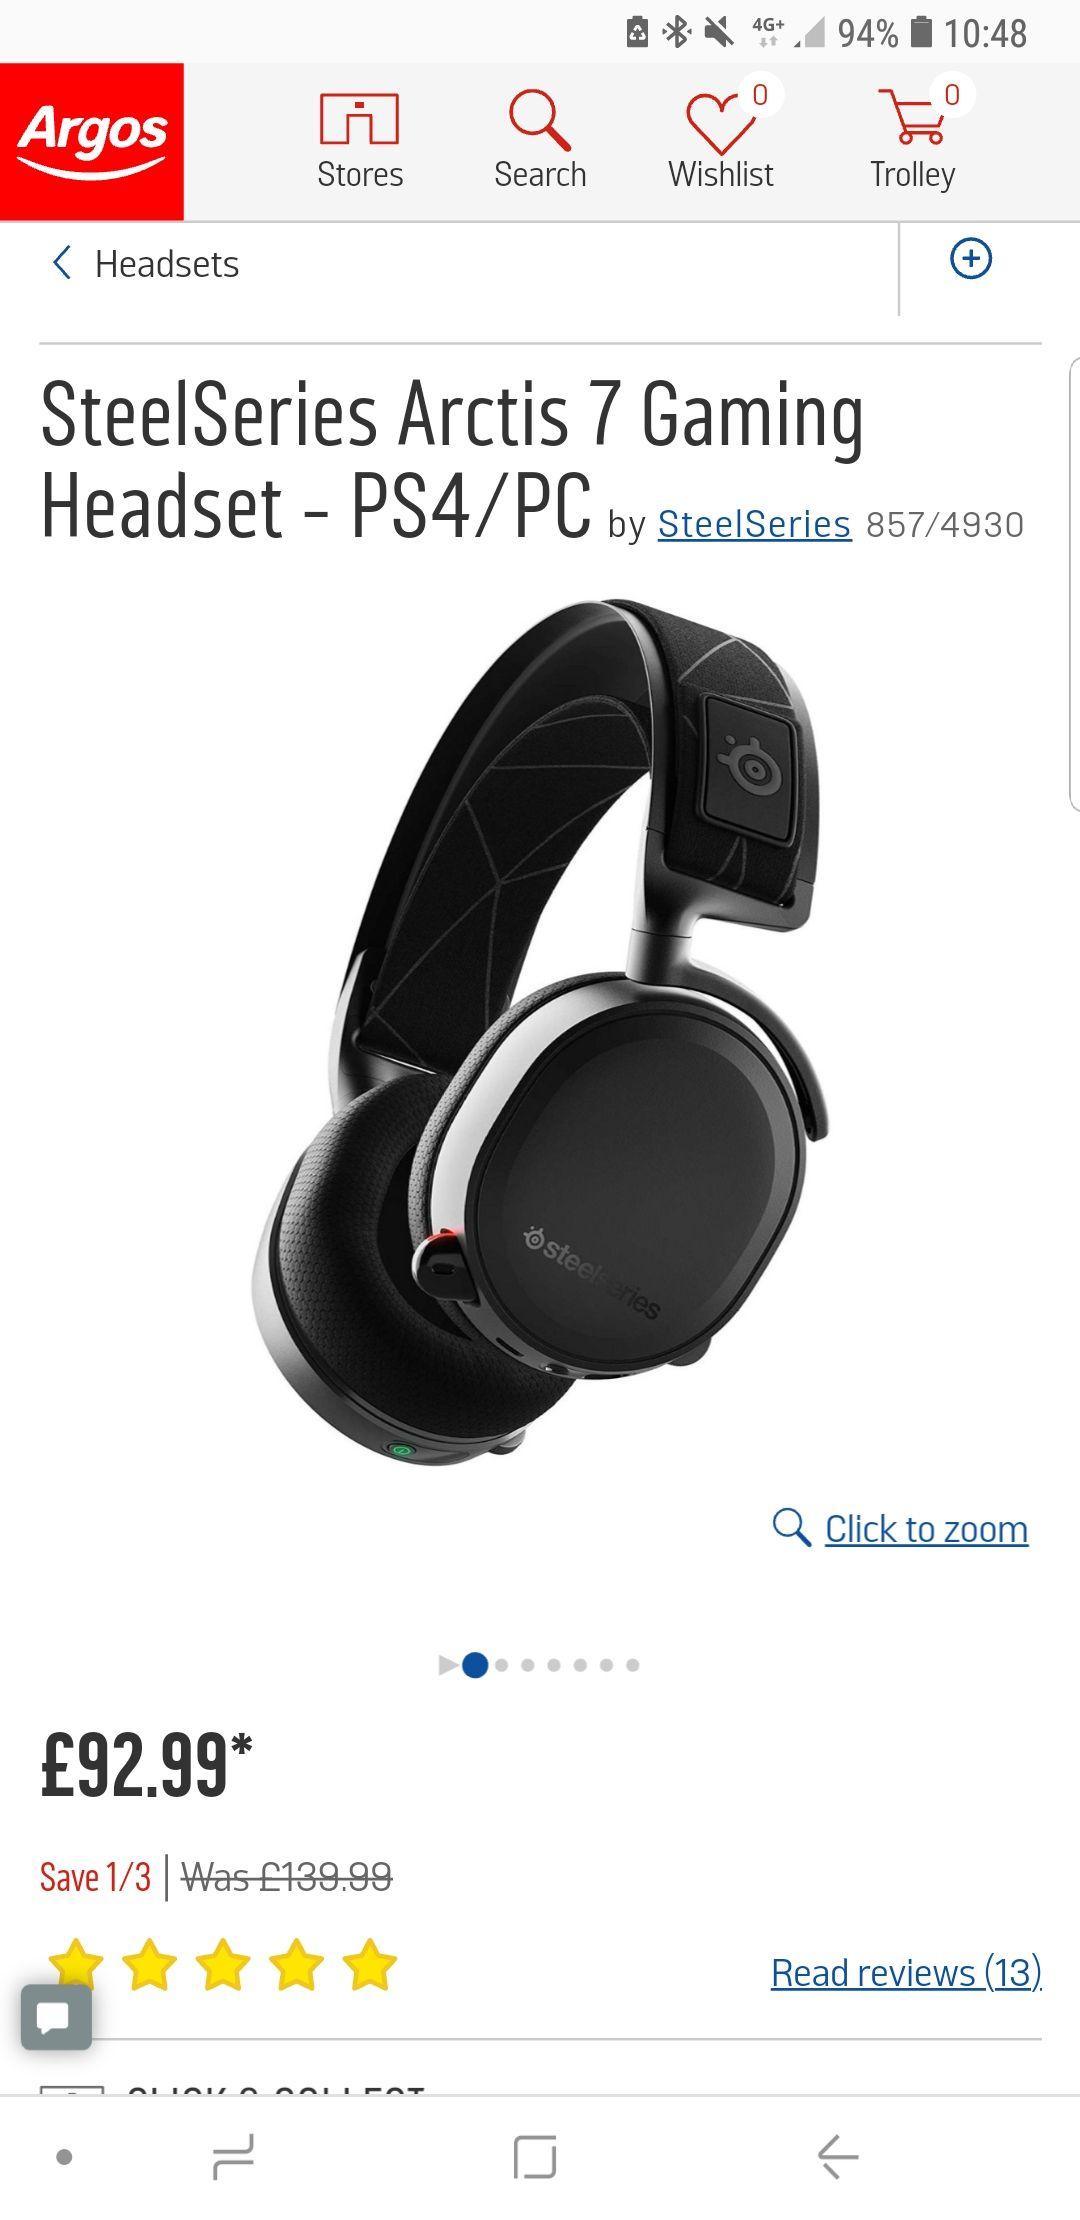 SteelSeries Arctis 7 Wireless Headset Argos £92.99